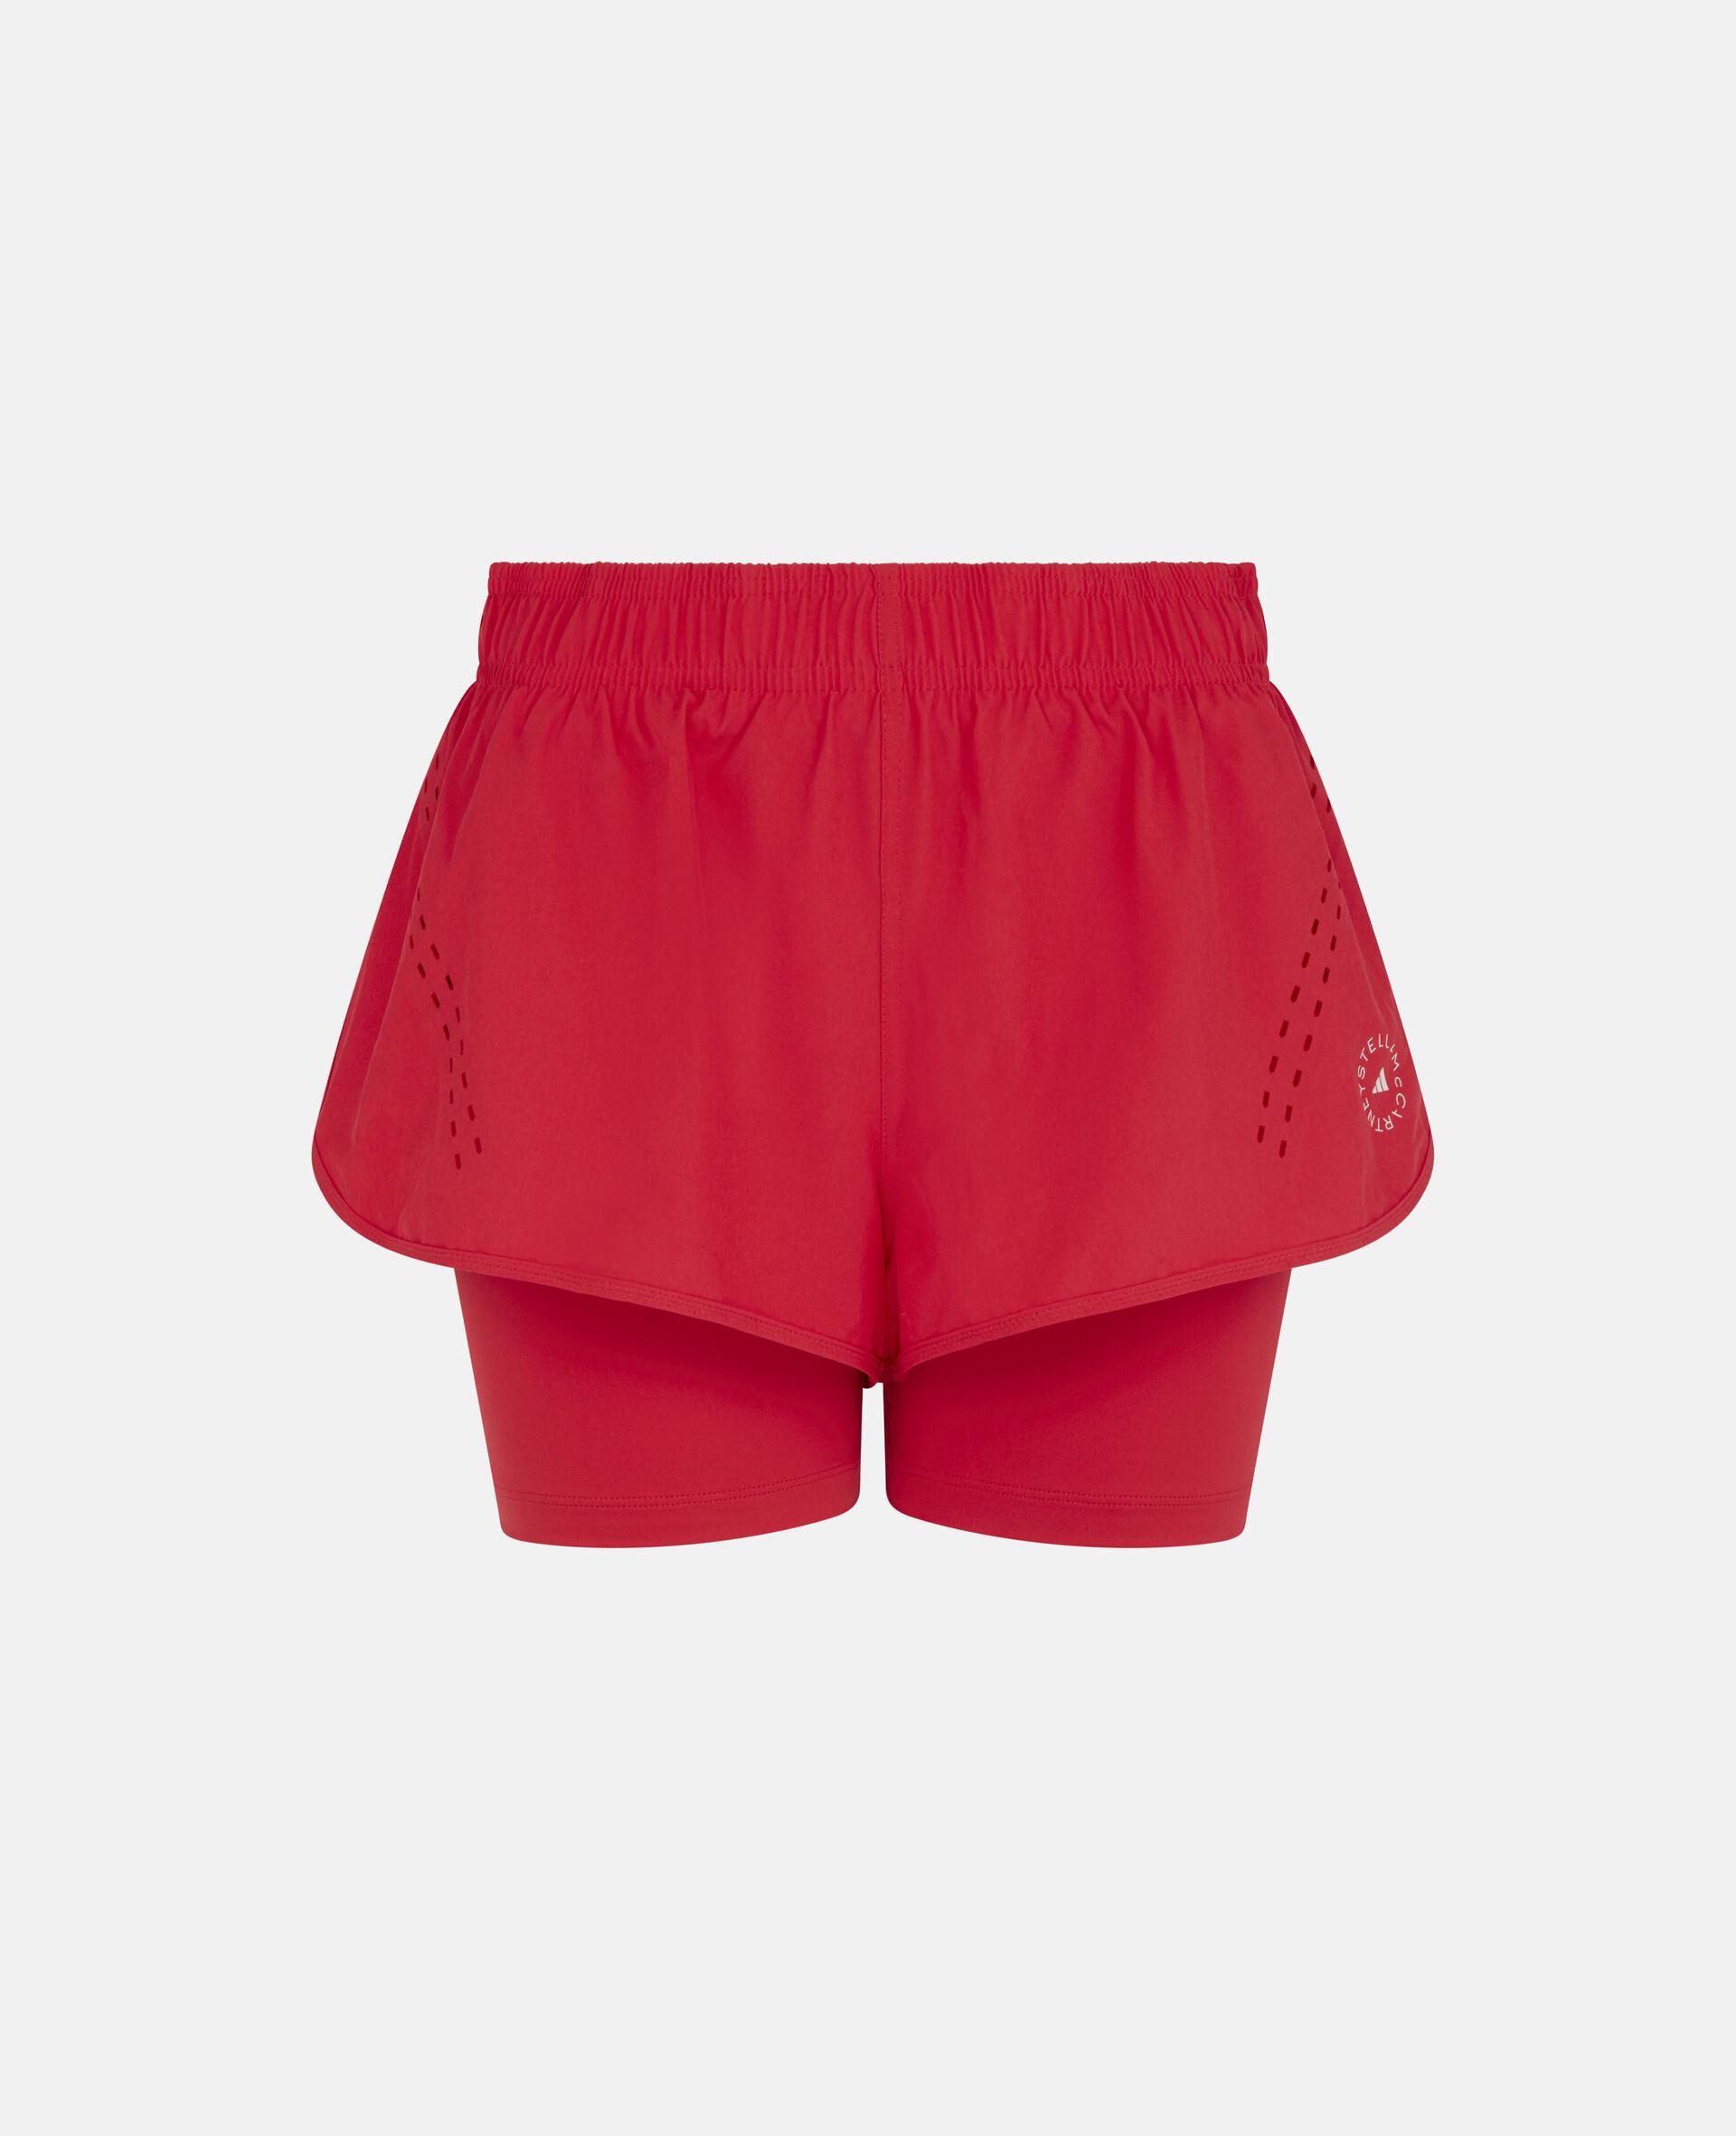 Rosa TruePurpose Trainings-Shorts-Rose-large image number 0